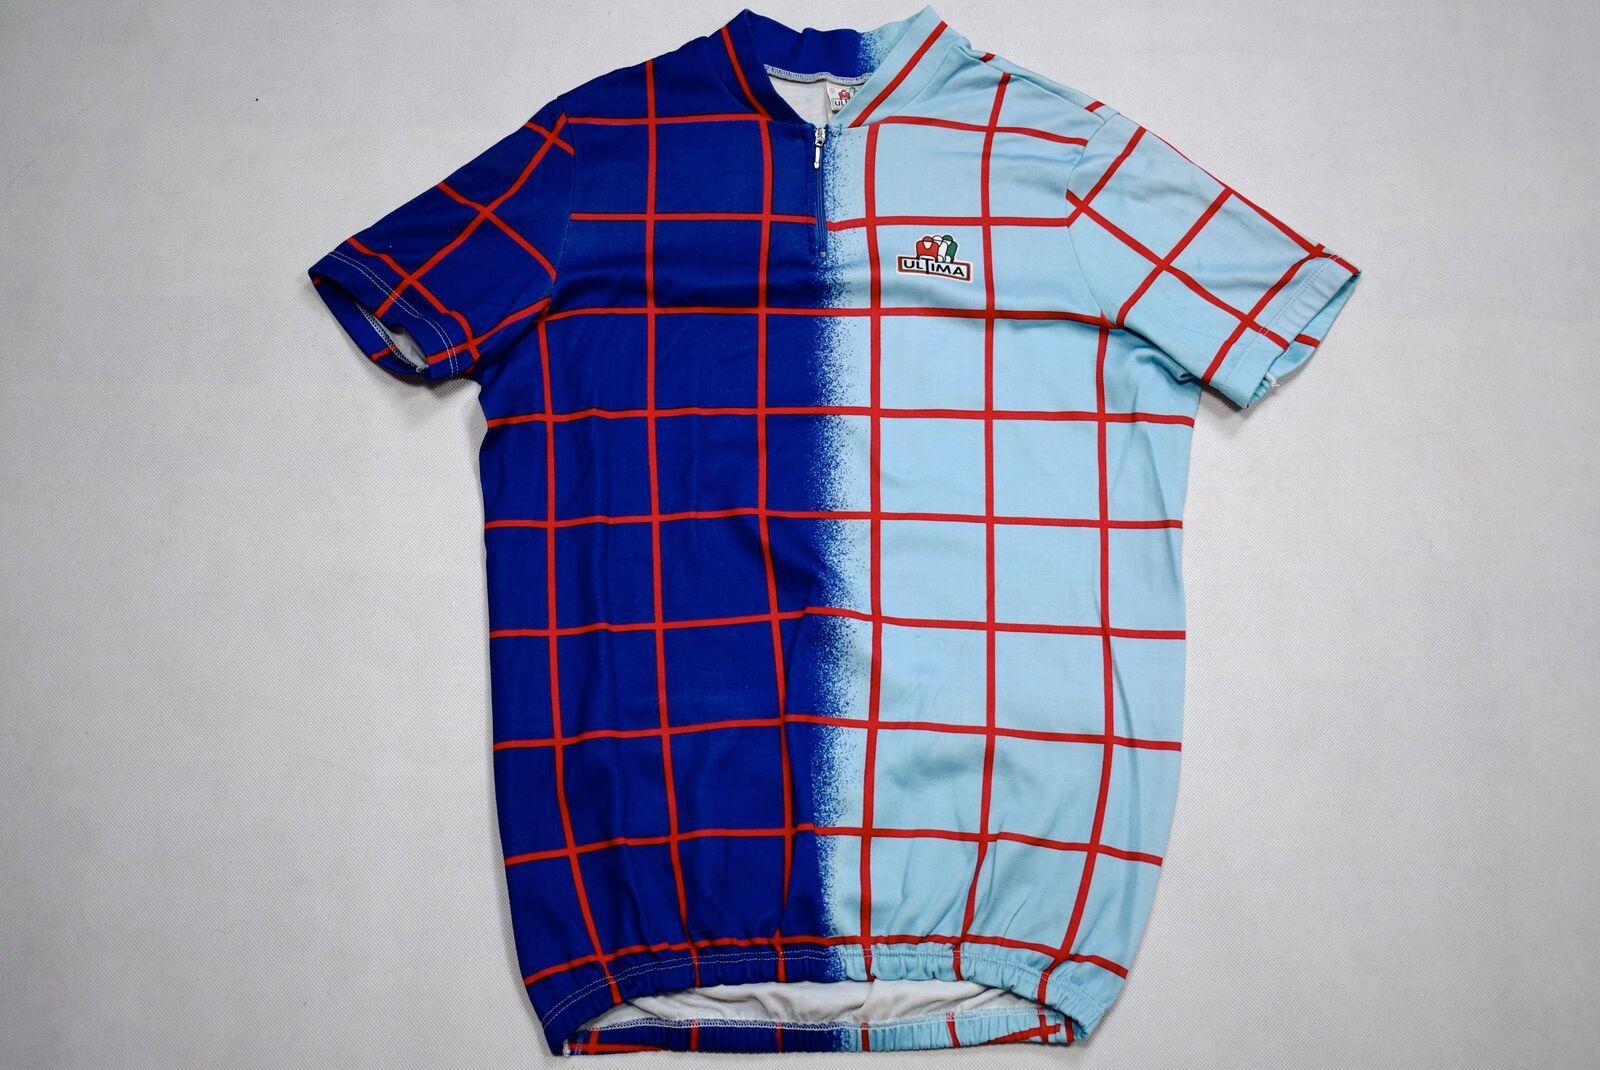 Ultima FahrradRad Trikot Shirt Maglia Camiseta Jersey Maillot Maillot Maillot Vintage 90s 5 ca L | Speichern  66584b